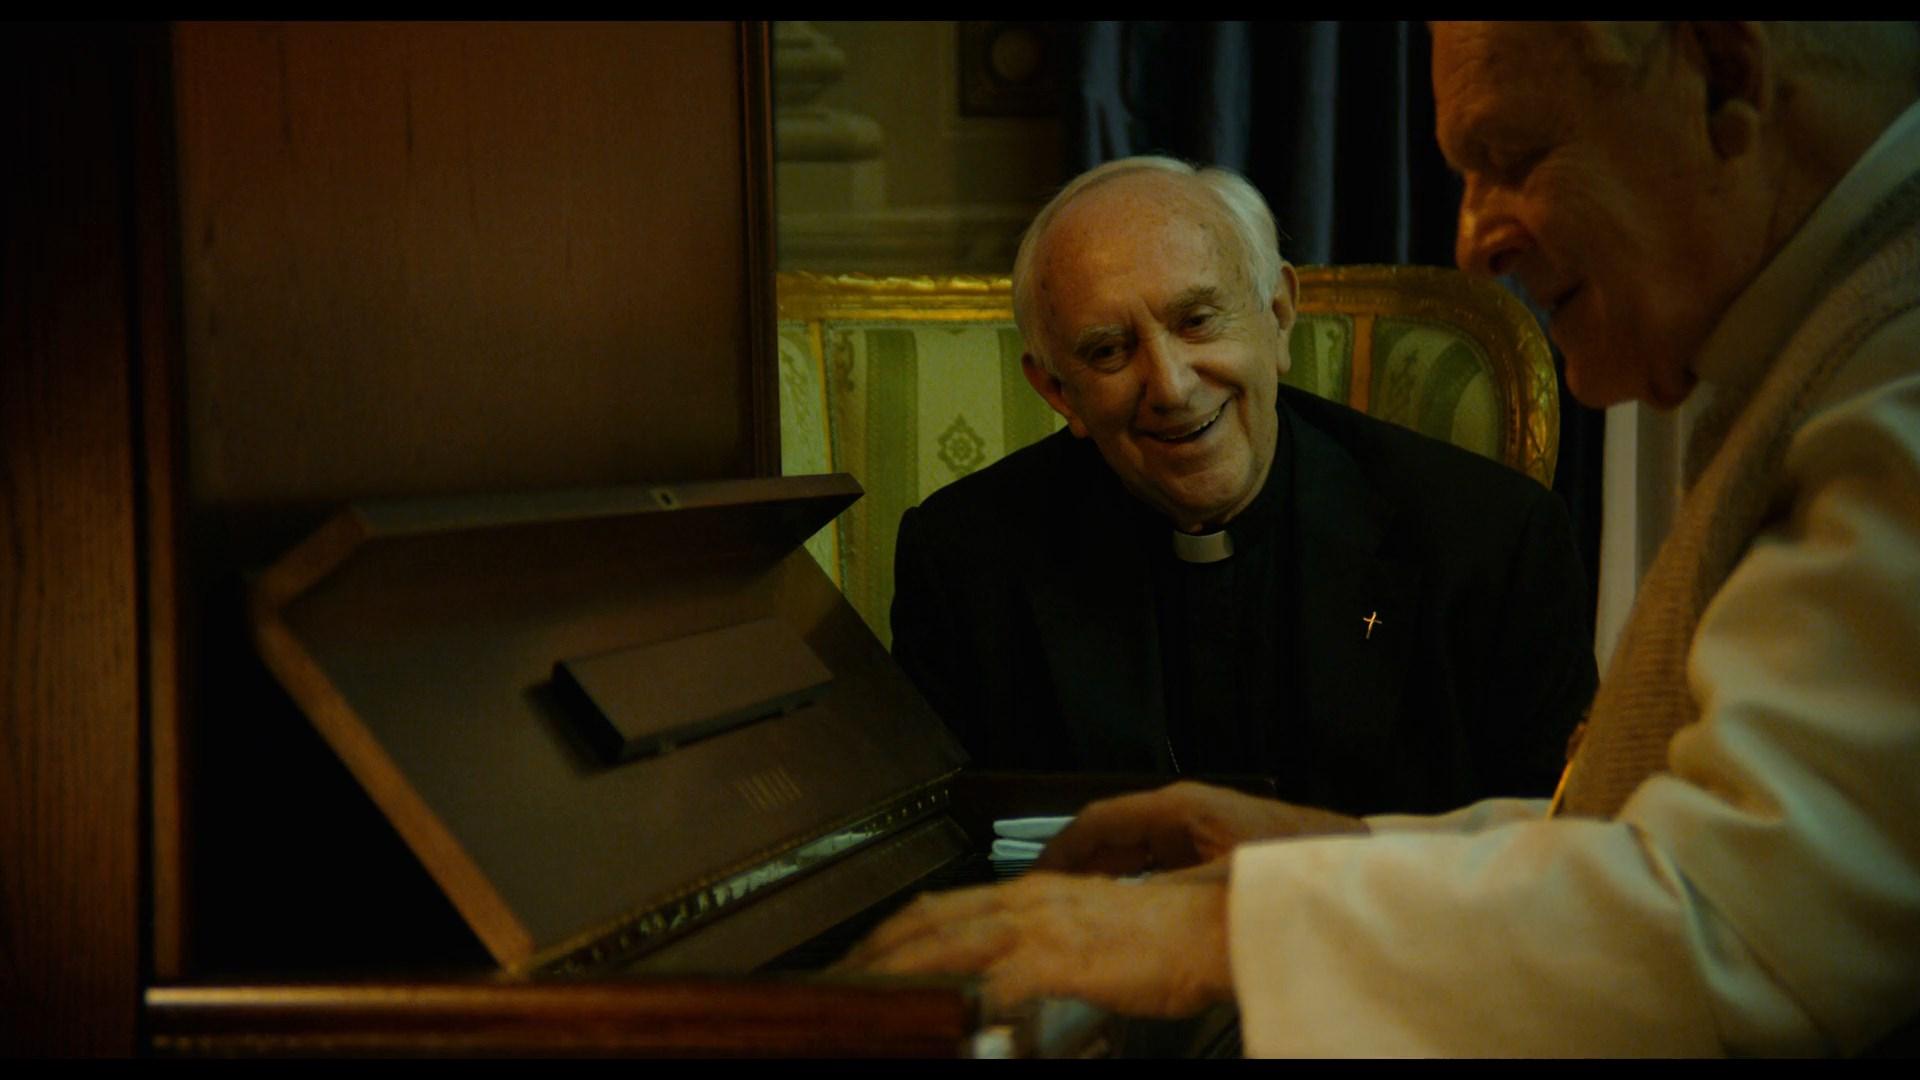 [Resim: the.two.popes.2019.102ykkj.jpg]